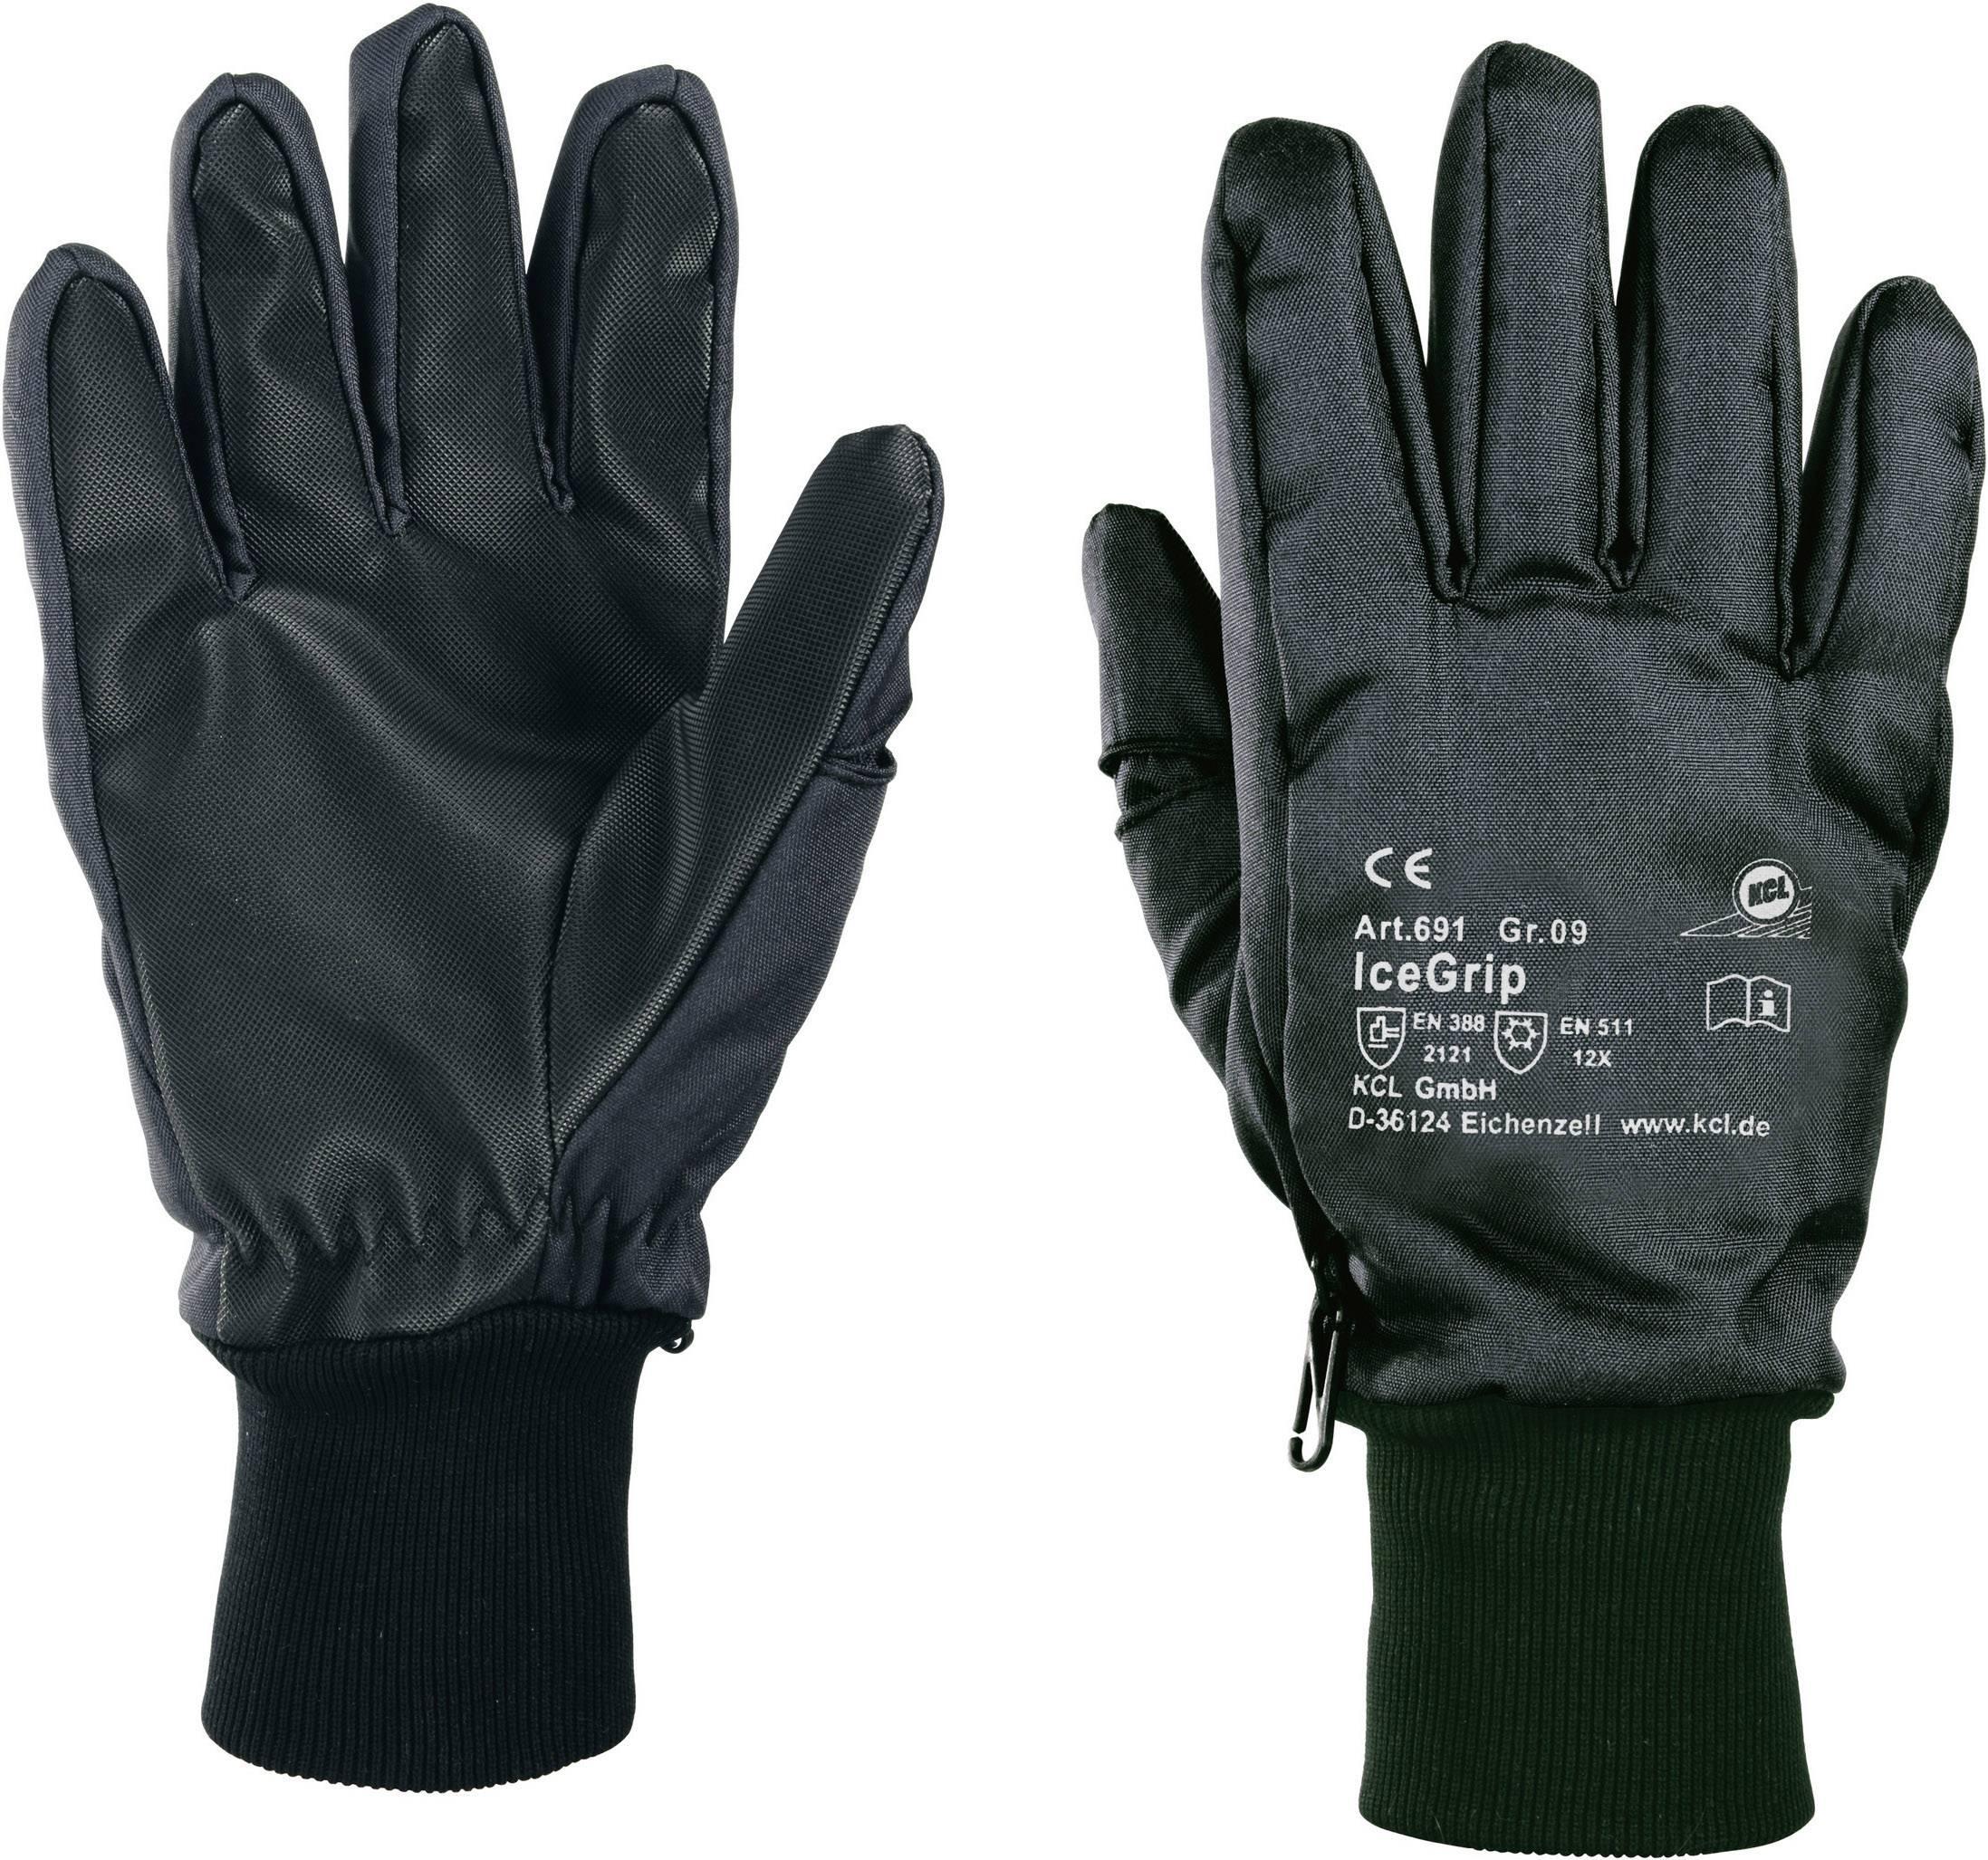 Pracovní rukavice KCL IceGrip 691 691, Thinsulate®, PVC, Polyamid, velikost rukavic: 11, XXL